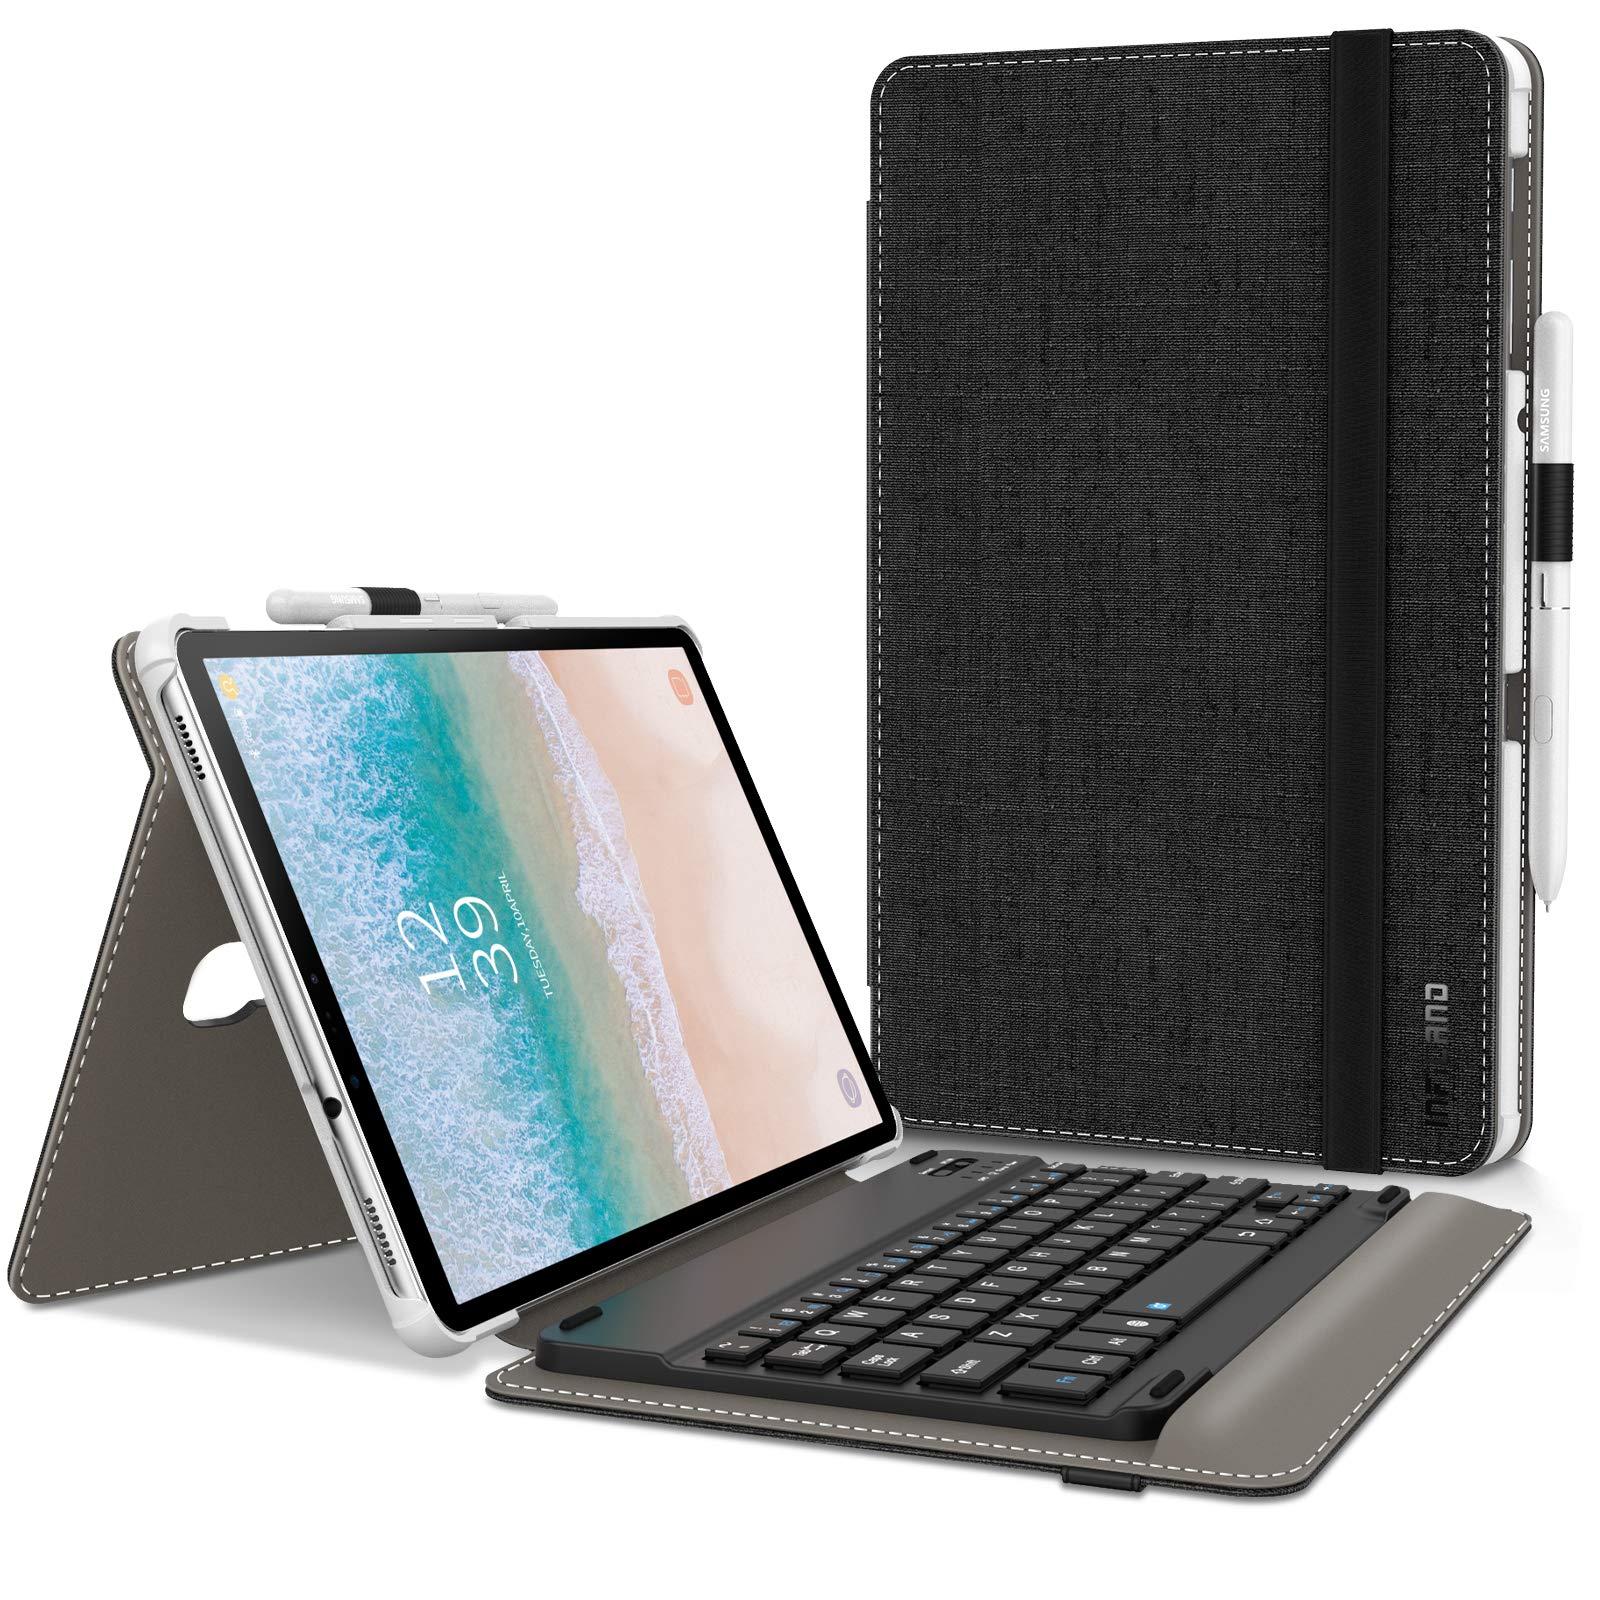 Funda + Teclado Galaxy Tab A 10.5 INFILAND [7MV3CKL8]